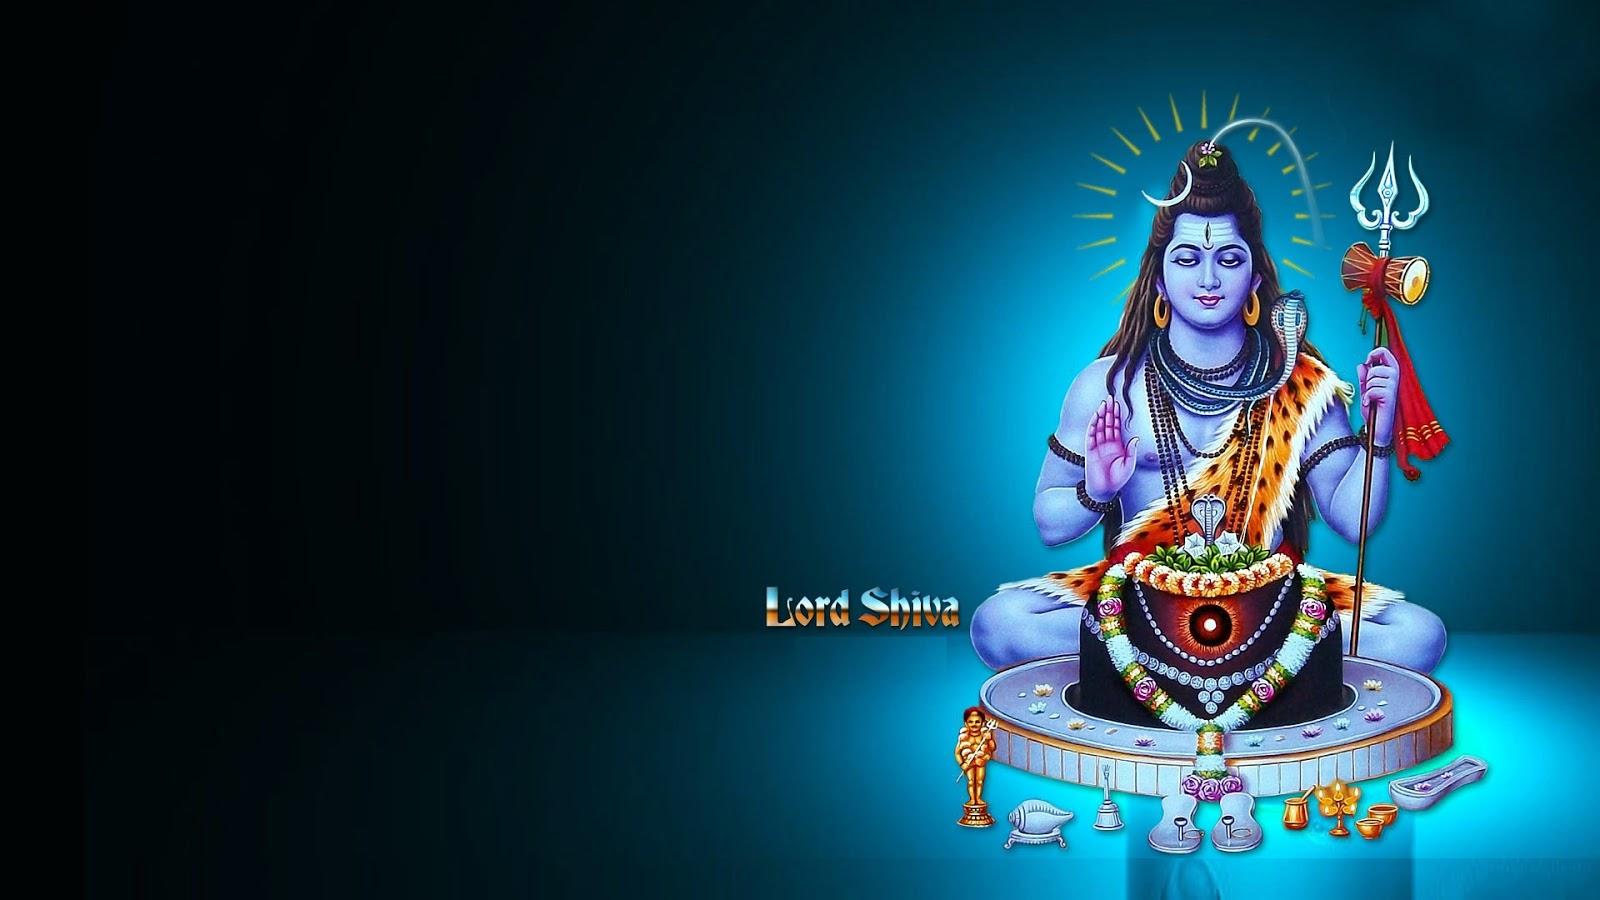 Mahashivratri Wallpaper 3d Happy Mahashivratri Images And Hd Wallpapers For Free